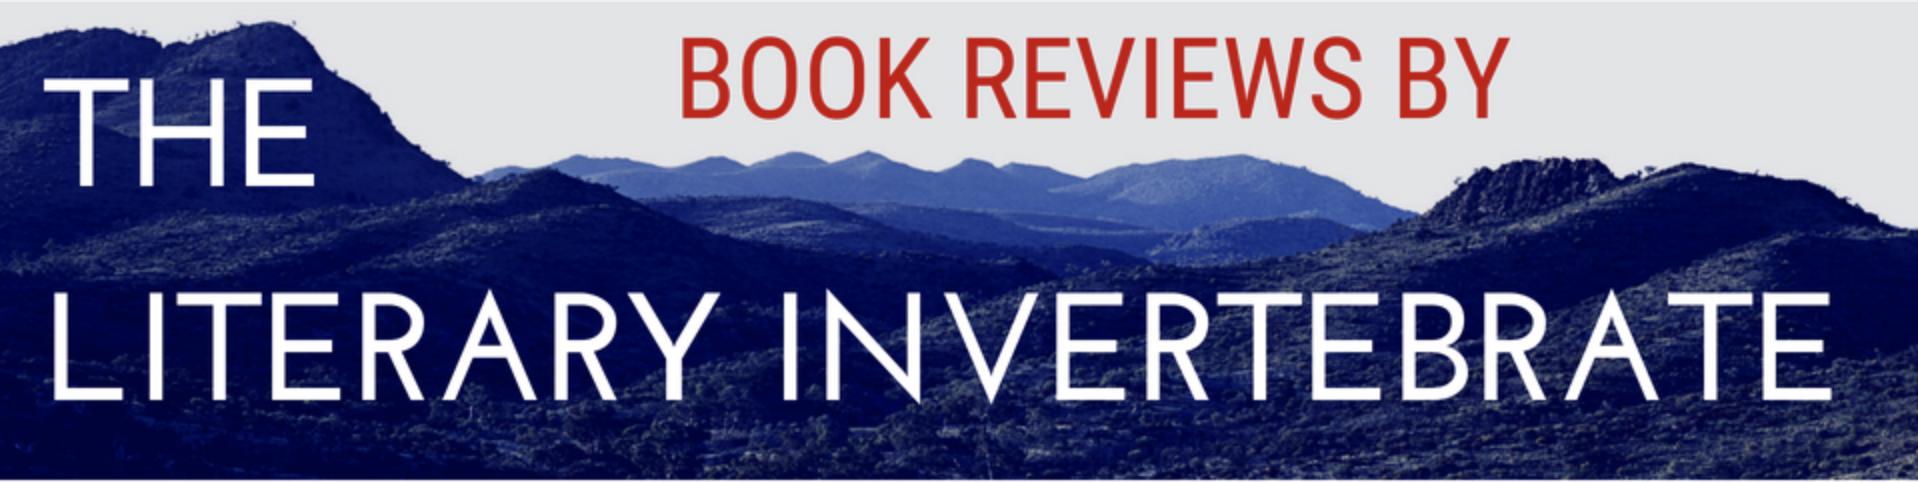 The Literary Invertebrate